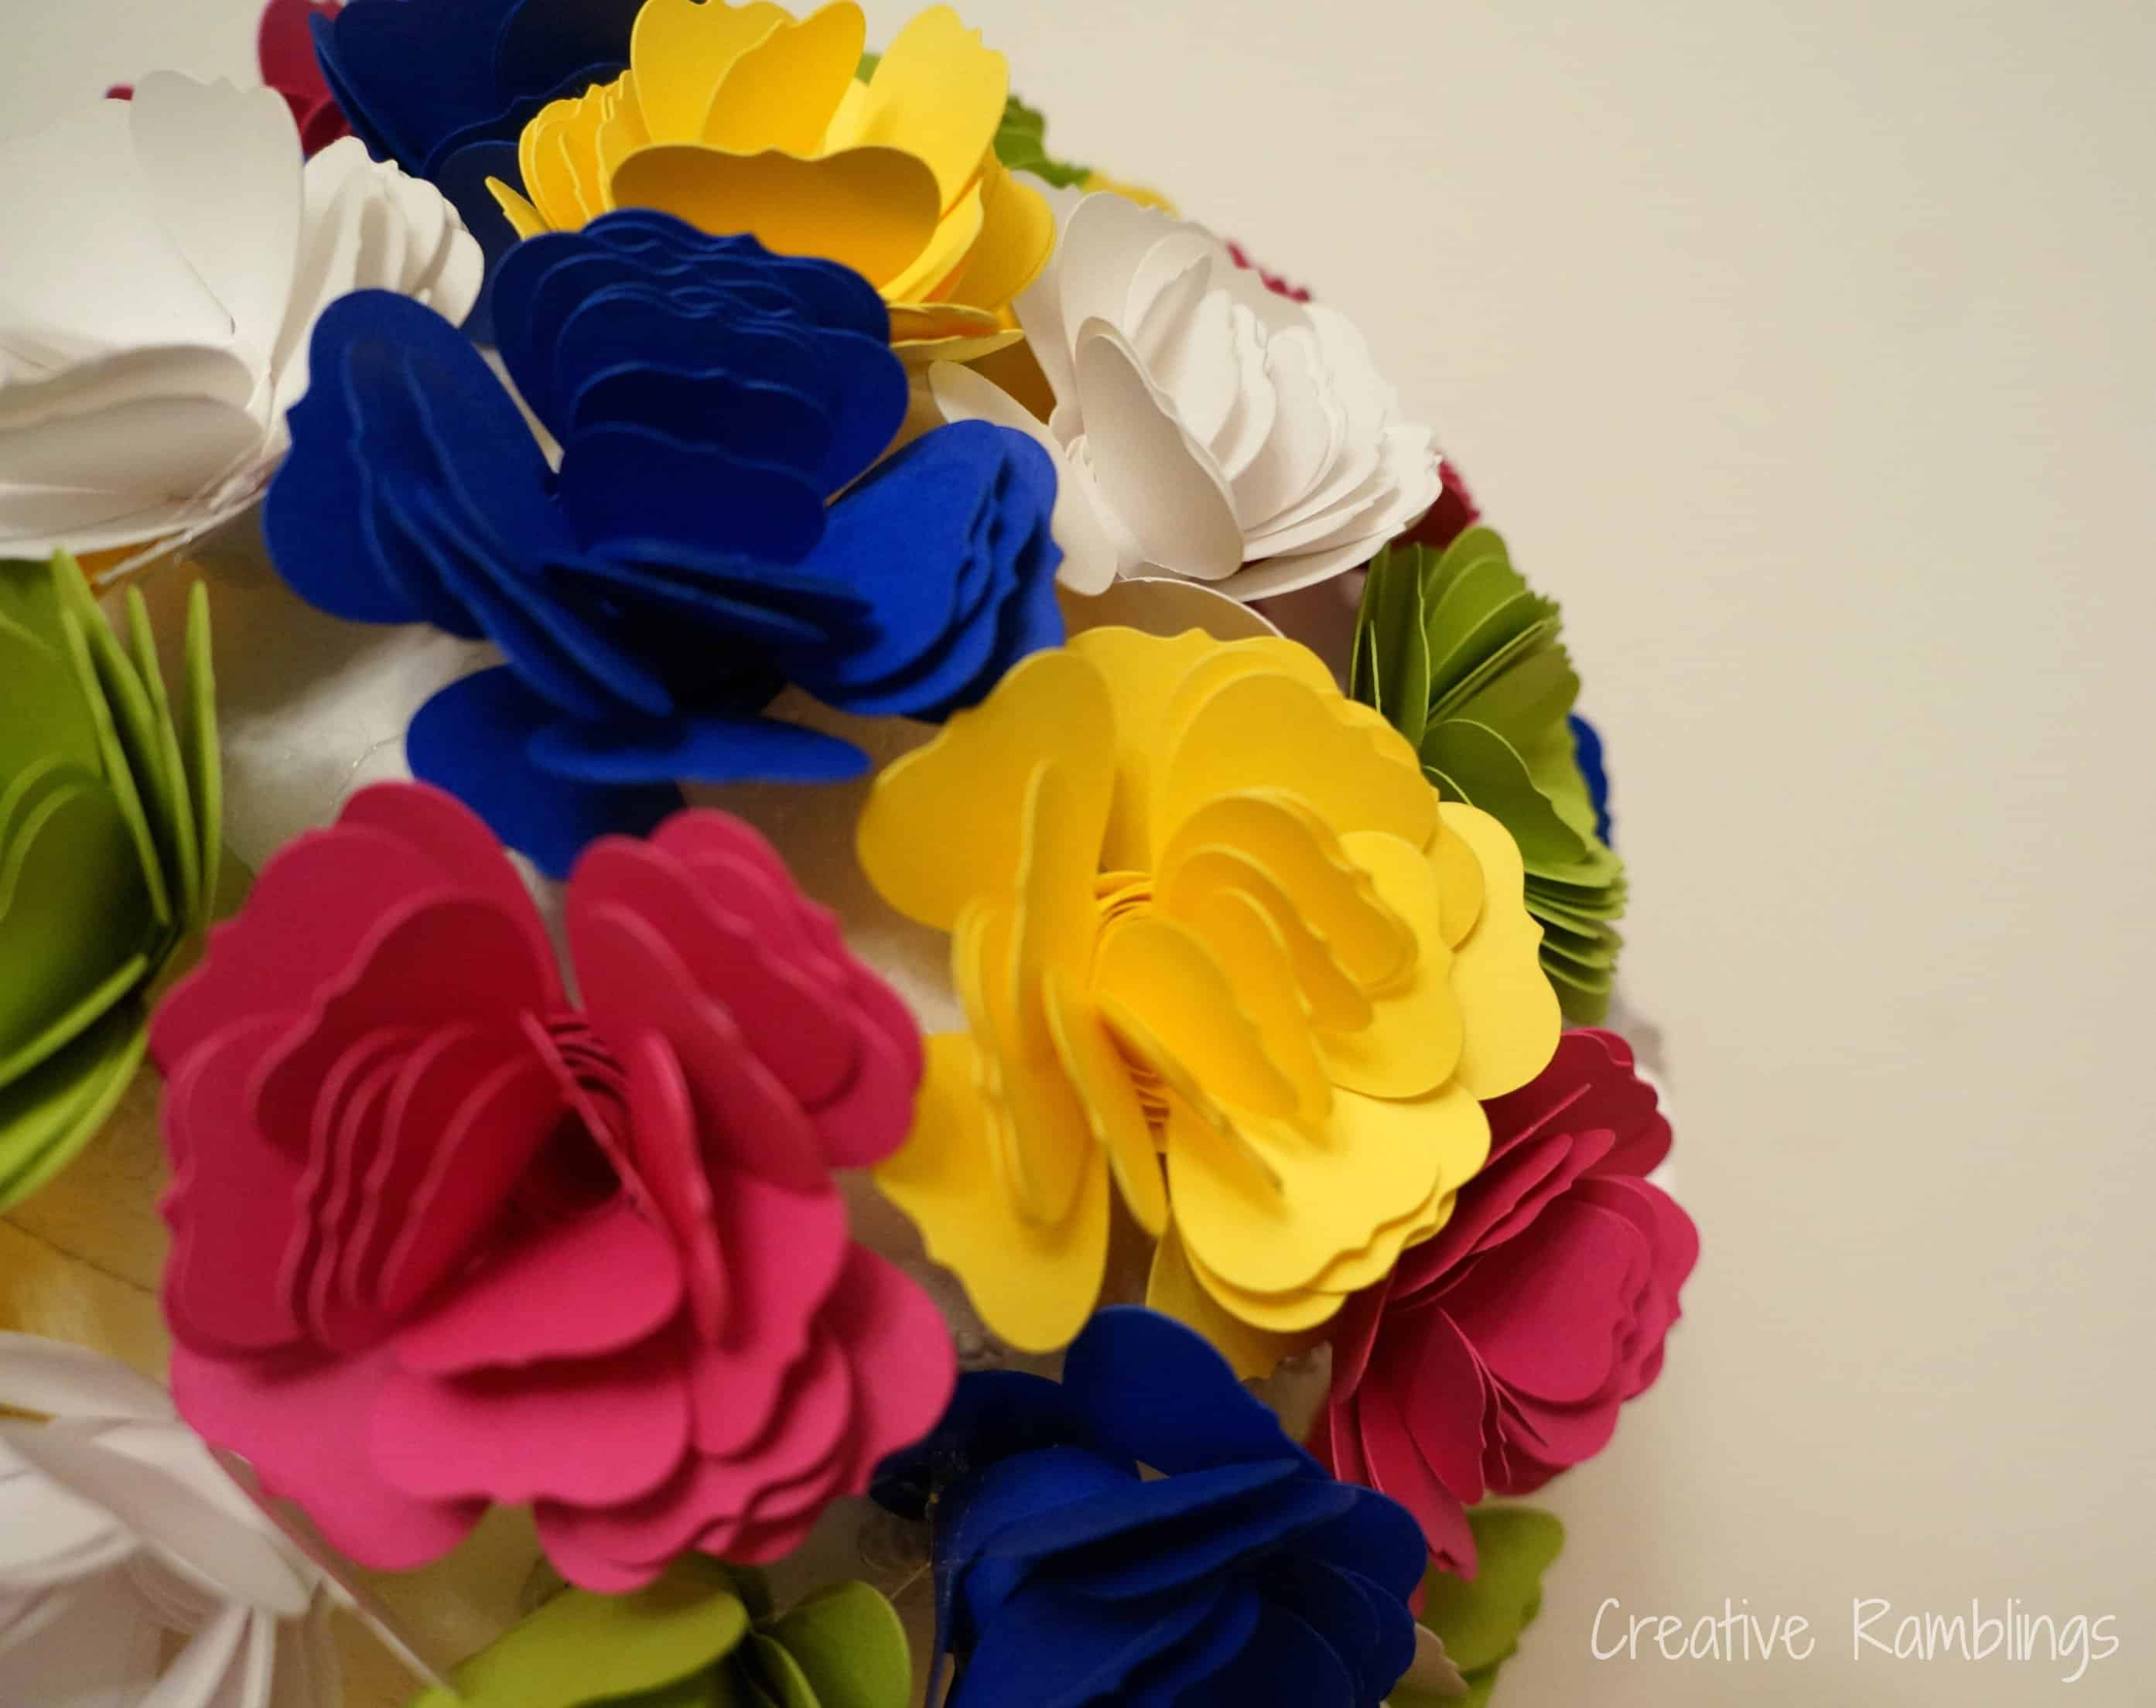 Paper Flower Topiary From Creative Ramblings Weekend Craft